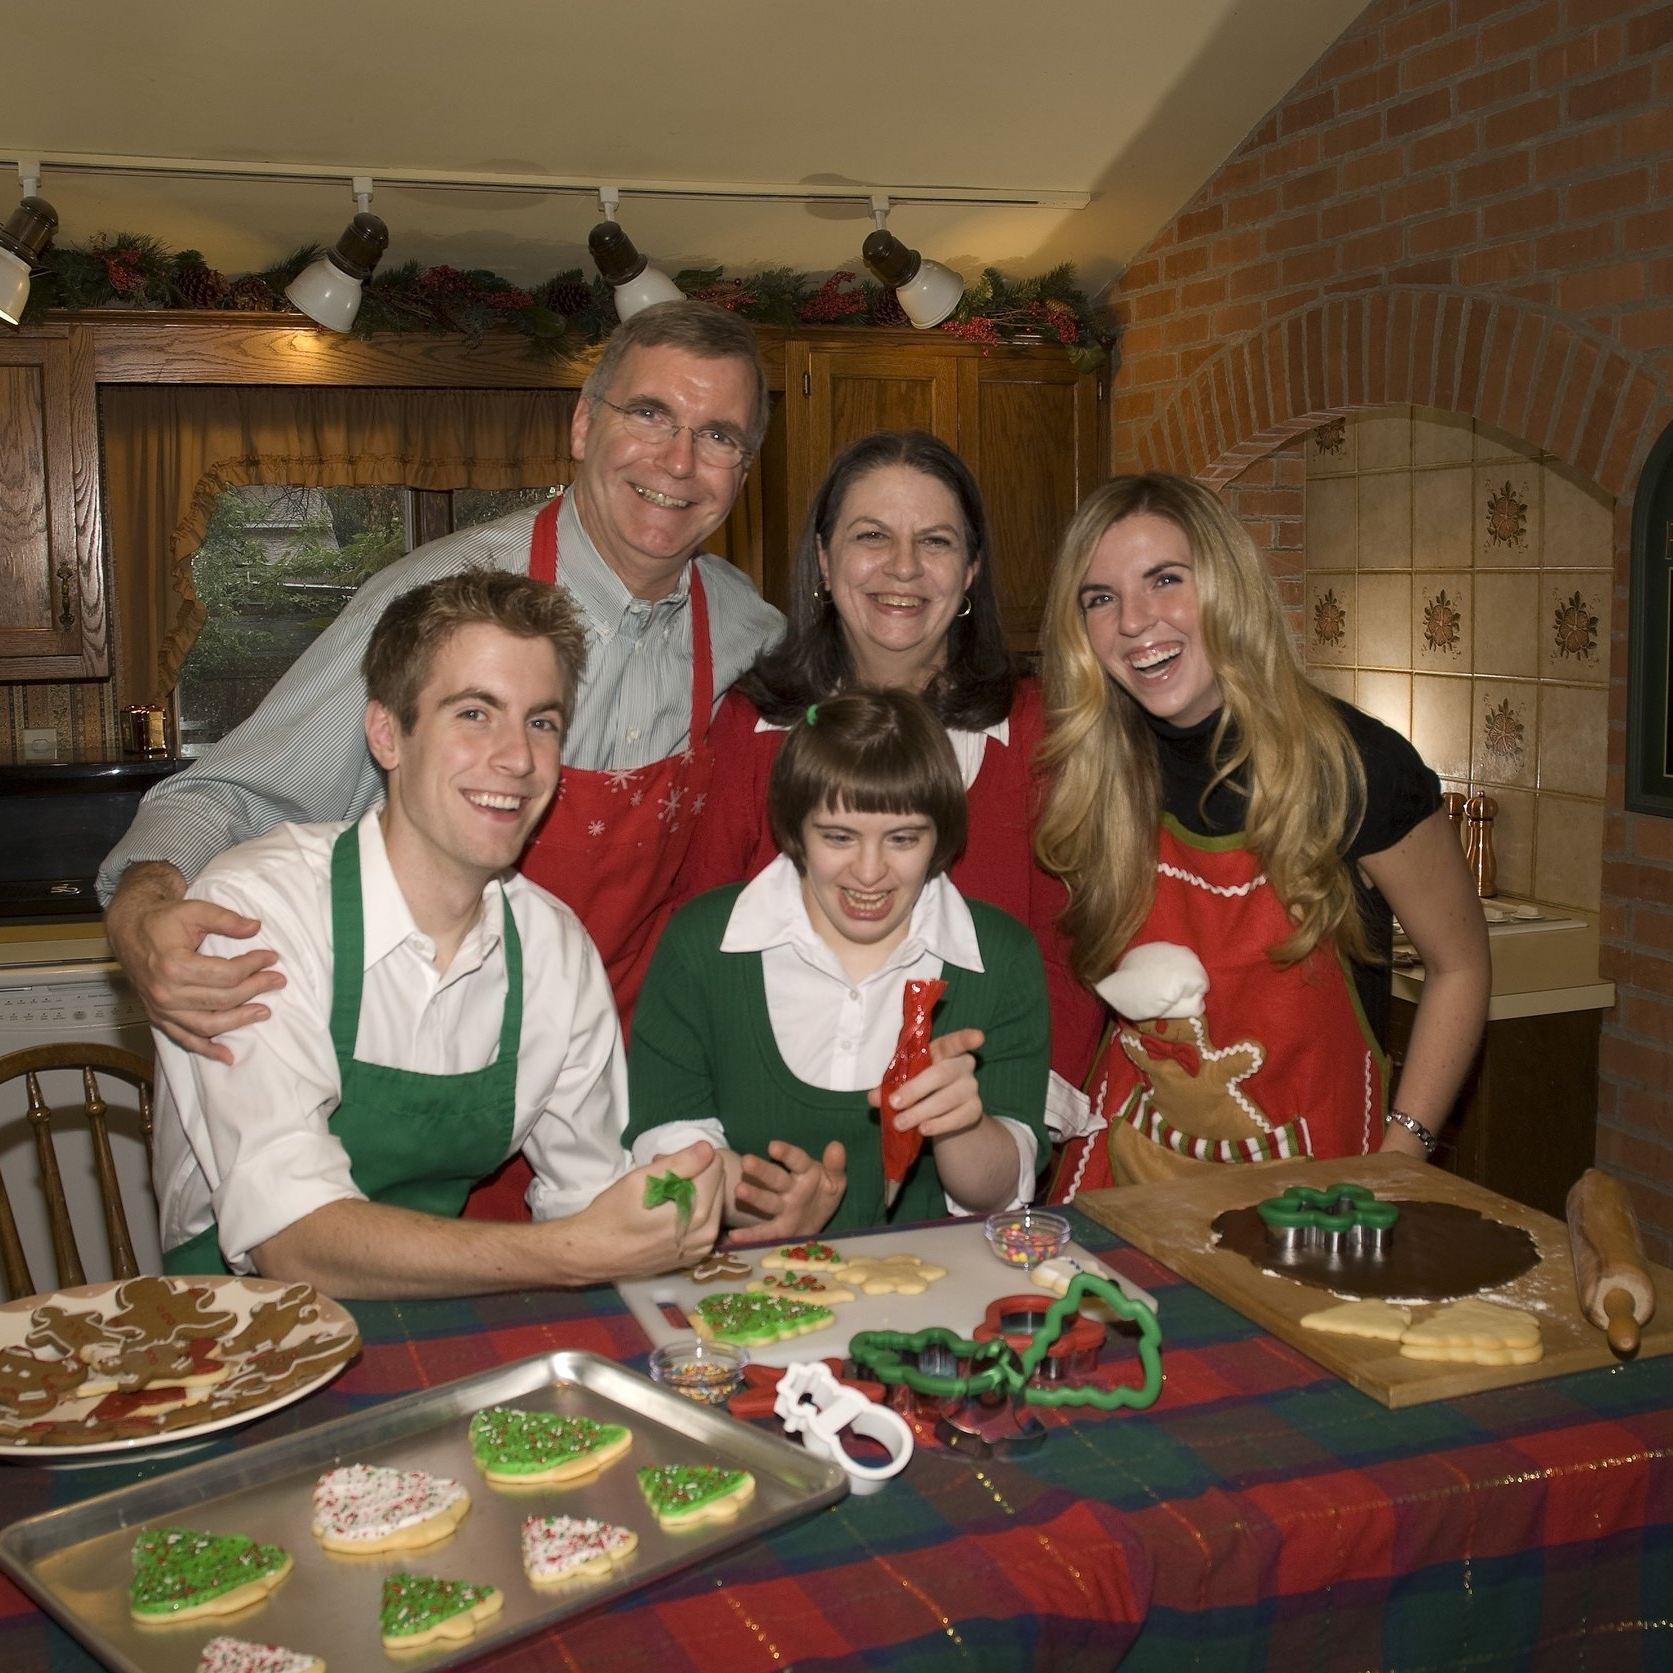 Joe's family: Wife, Rhonda, and Children, Jaime, Jodi, and Joe